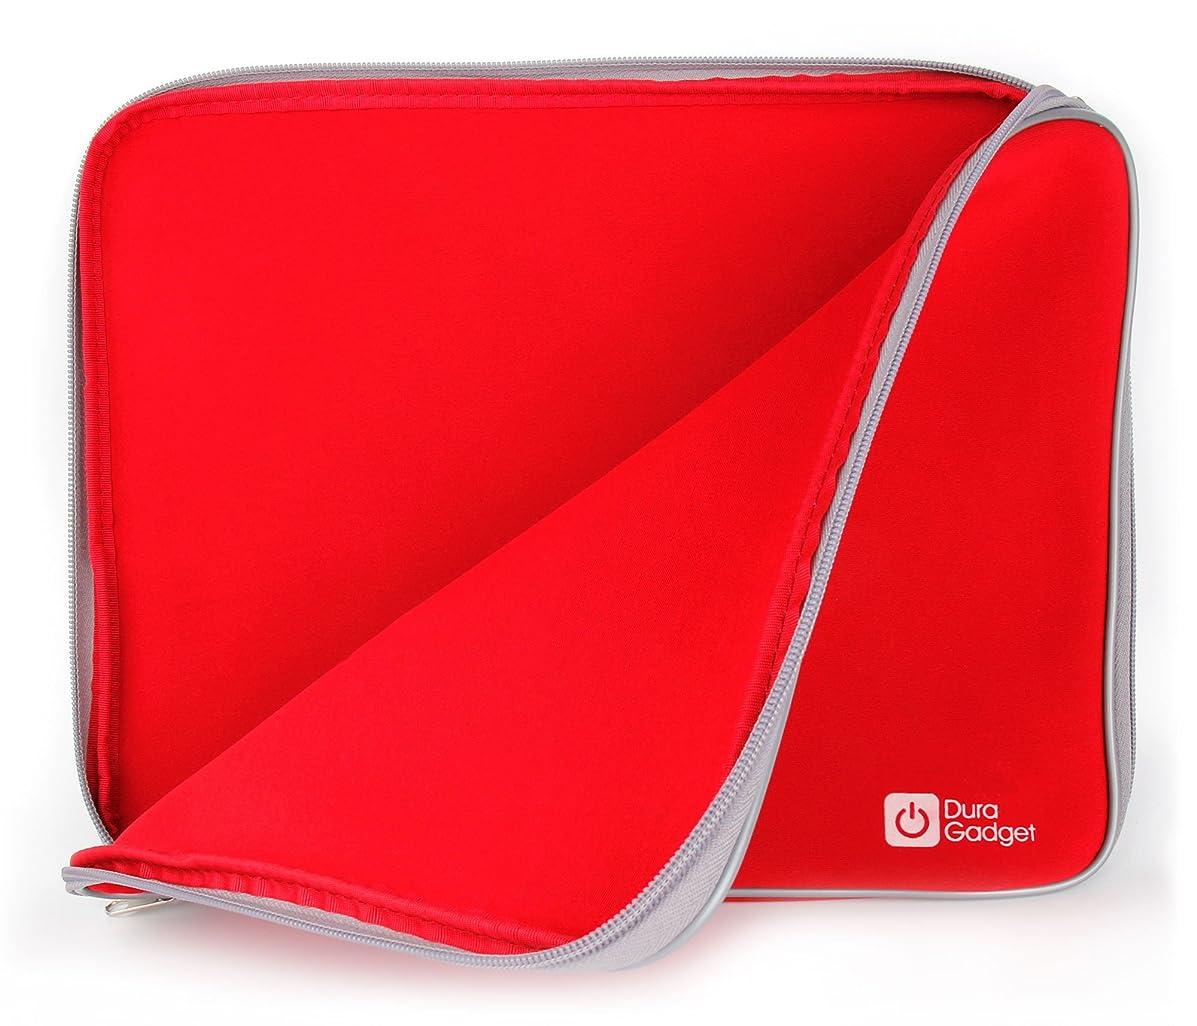 DURAGADGET Neoprene Protective Laptop Case for Samsung R540 15.6